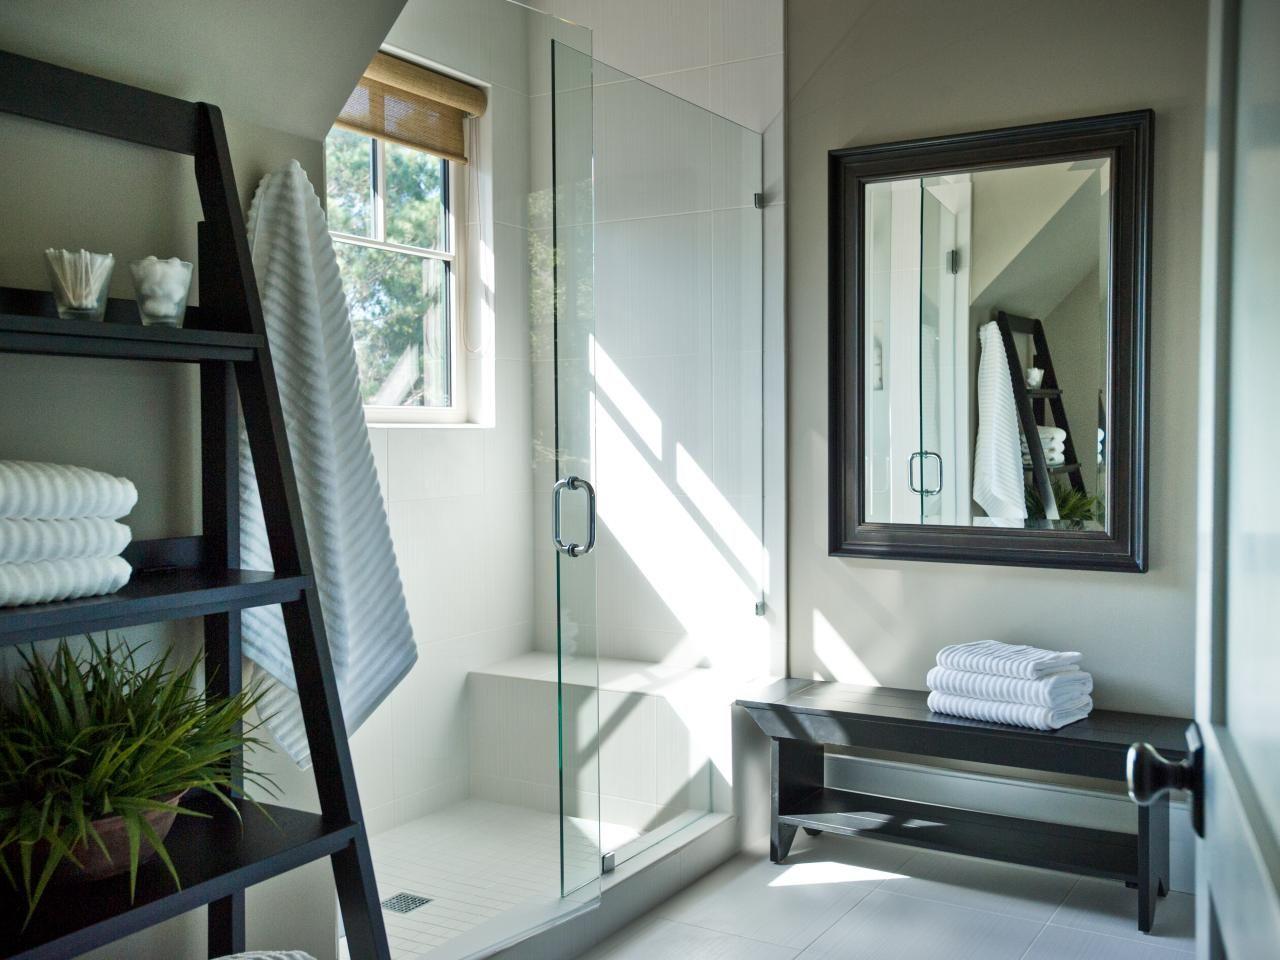 Bathroom Decorating Tips and Ideas | Midcentury modern, Bathroom ...